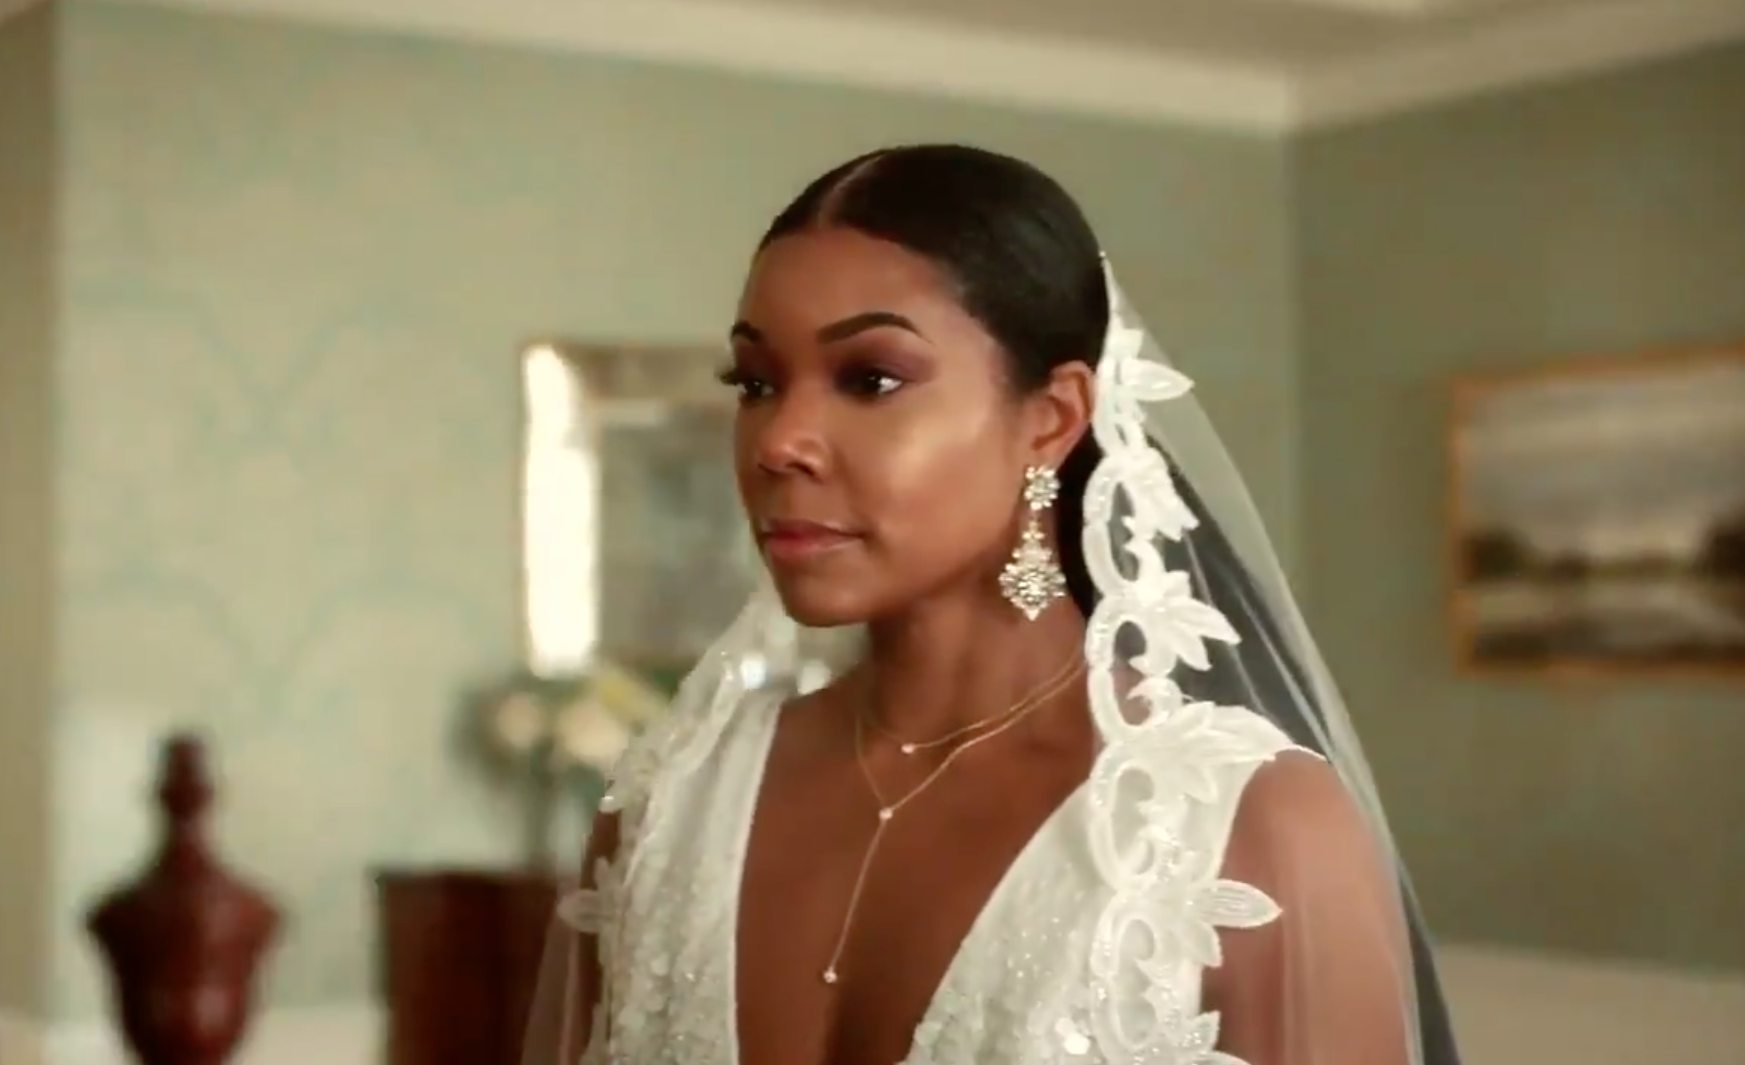 Gabrielle Union Bio, Age, Parents, Siblings, Movies